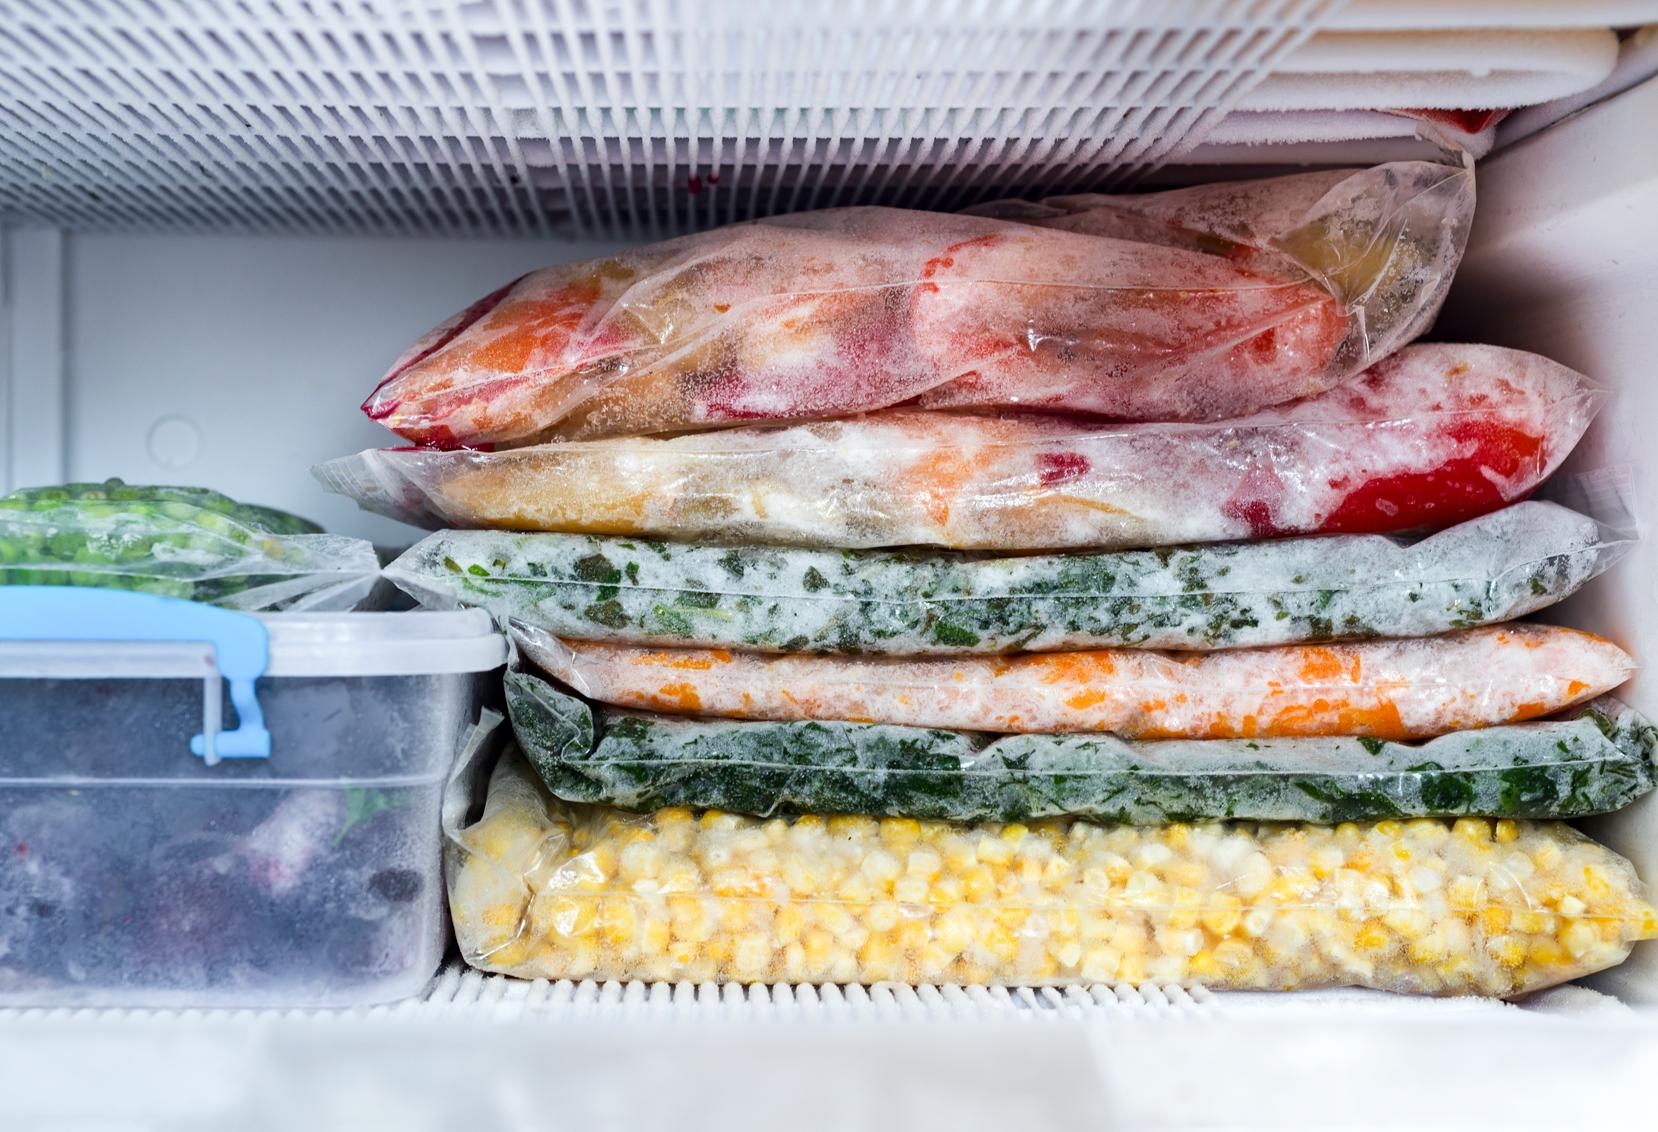 Quer Congelar Os Alimentos? Mitos E Verdades